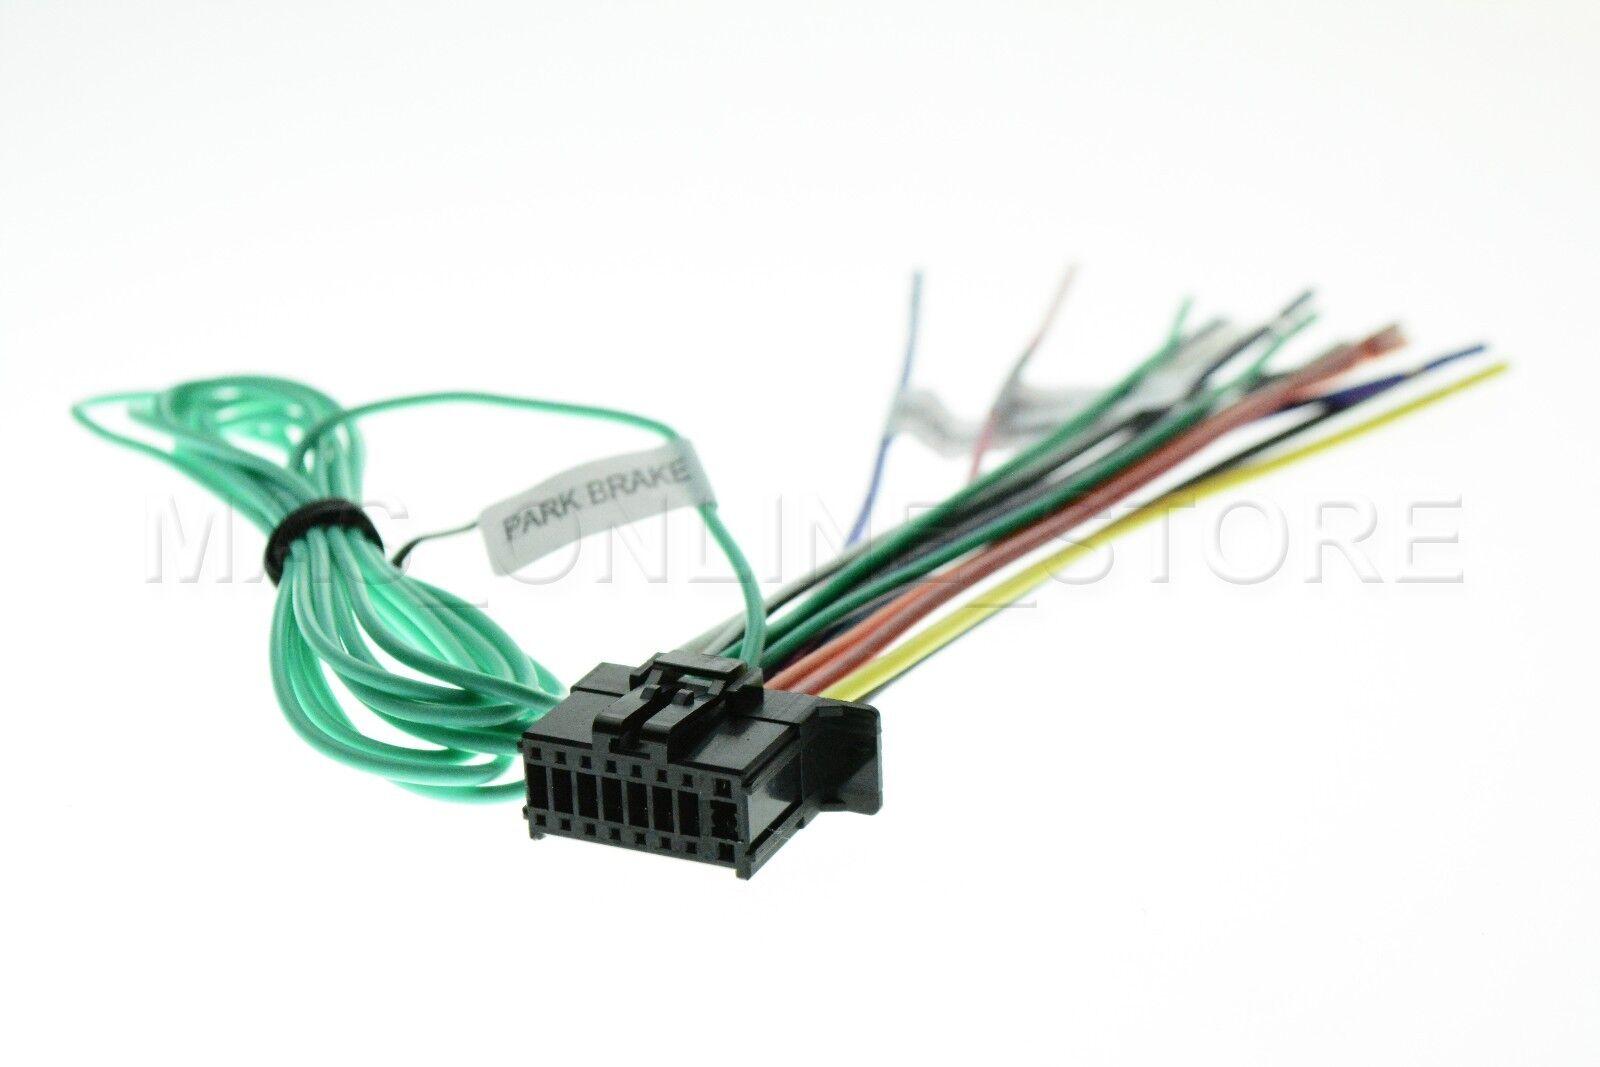 Wire Harness For Pioneer Avic 7201nex Avic7201nex Ebay Electronics Wiring Diagram